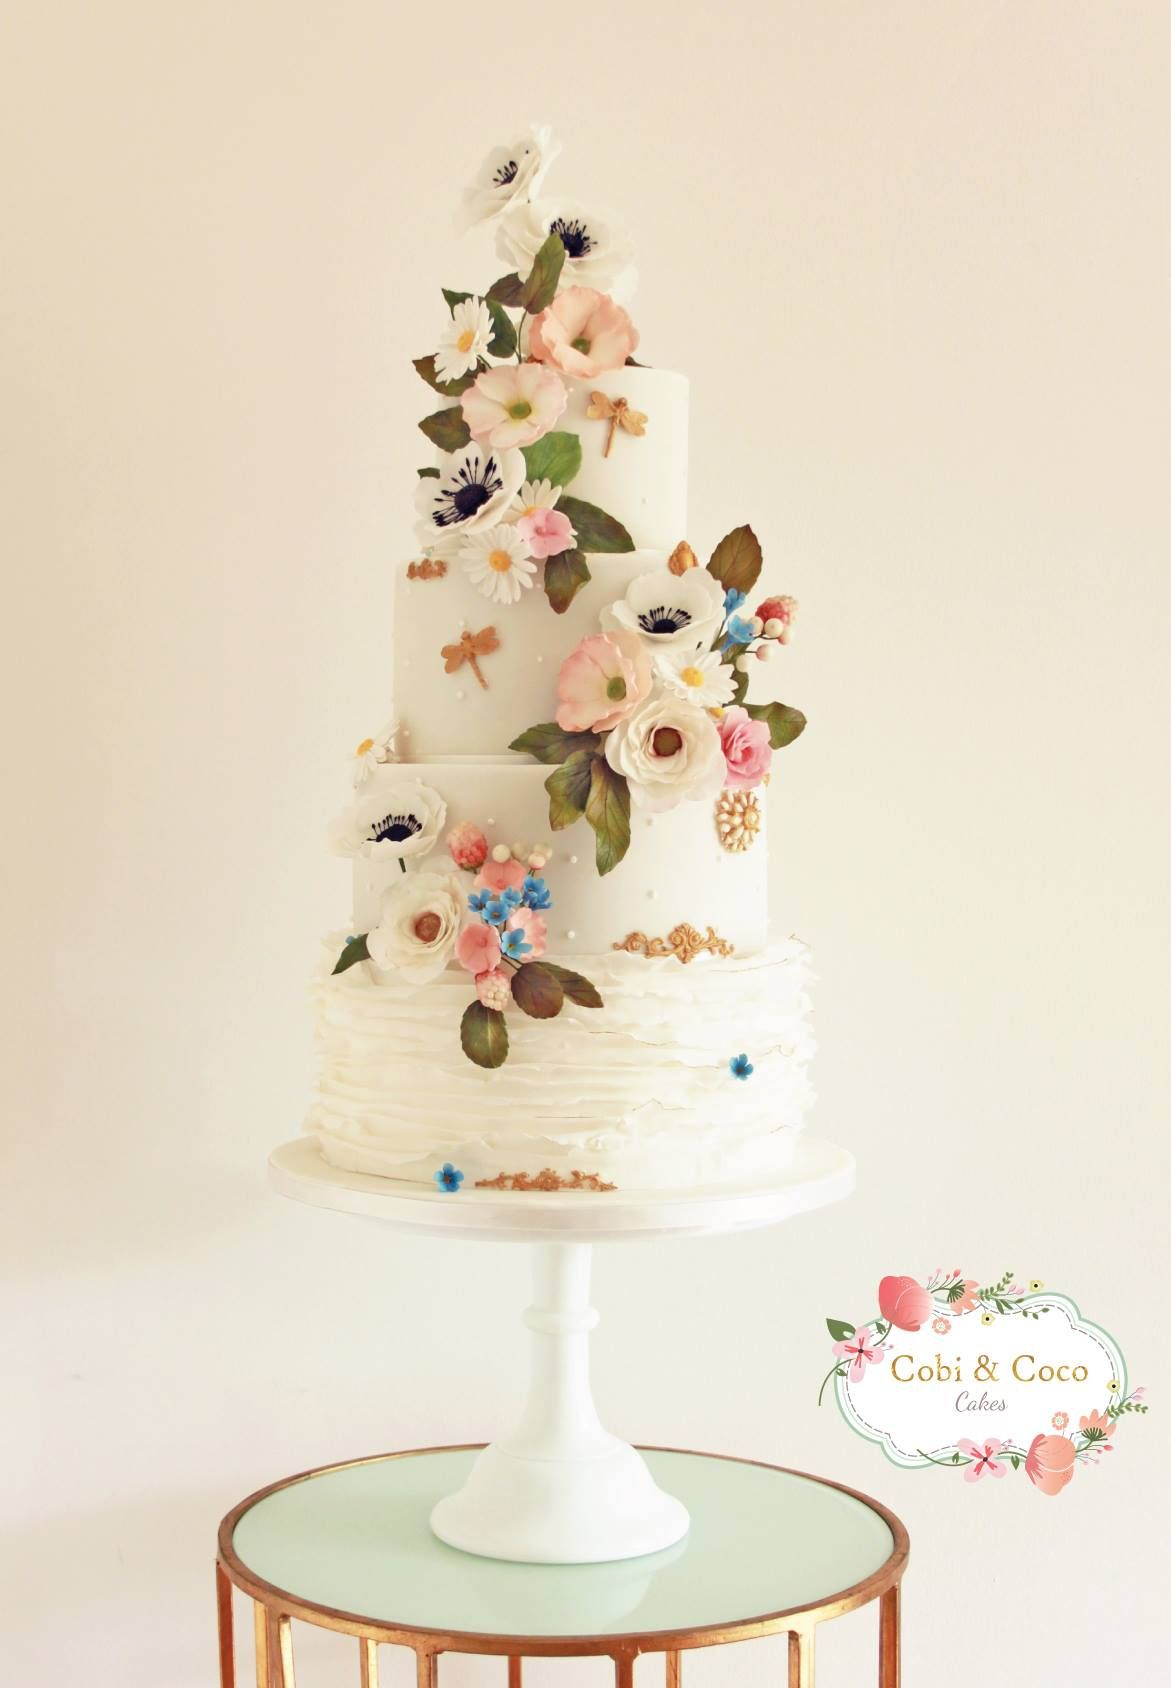 Cobi Coco Cakes Wedding Cake Strain Chocolate Wedding Cake Beautiful Wedding Cakes